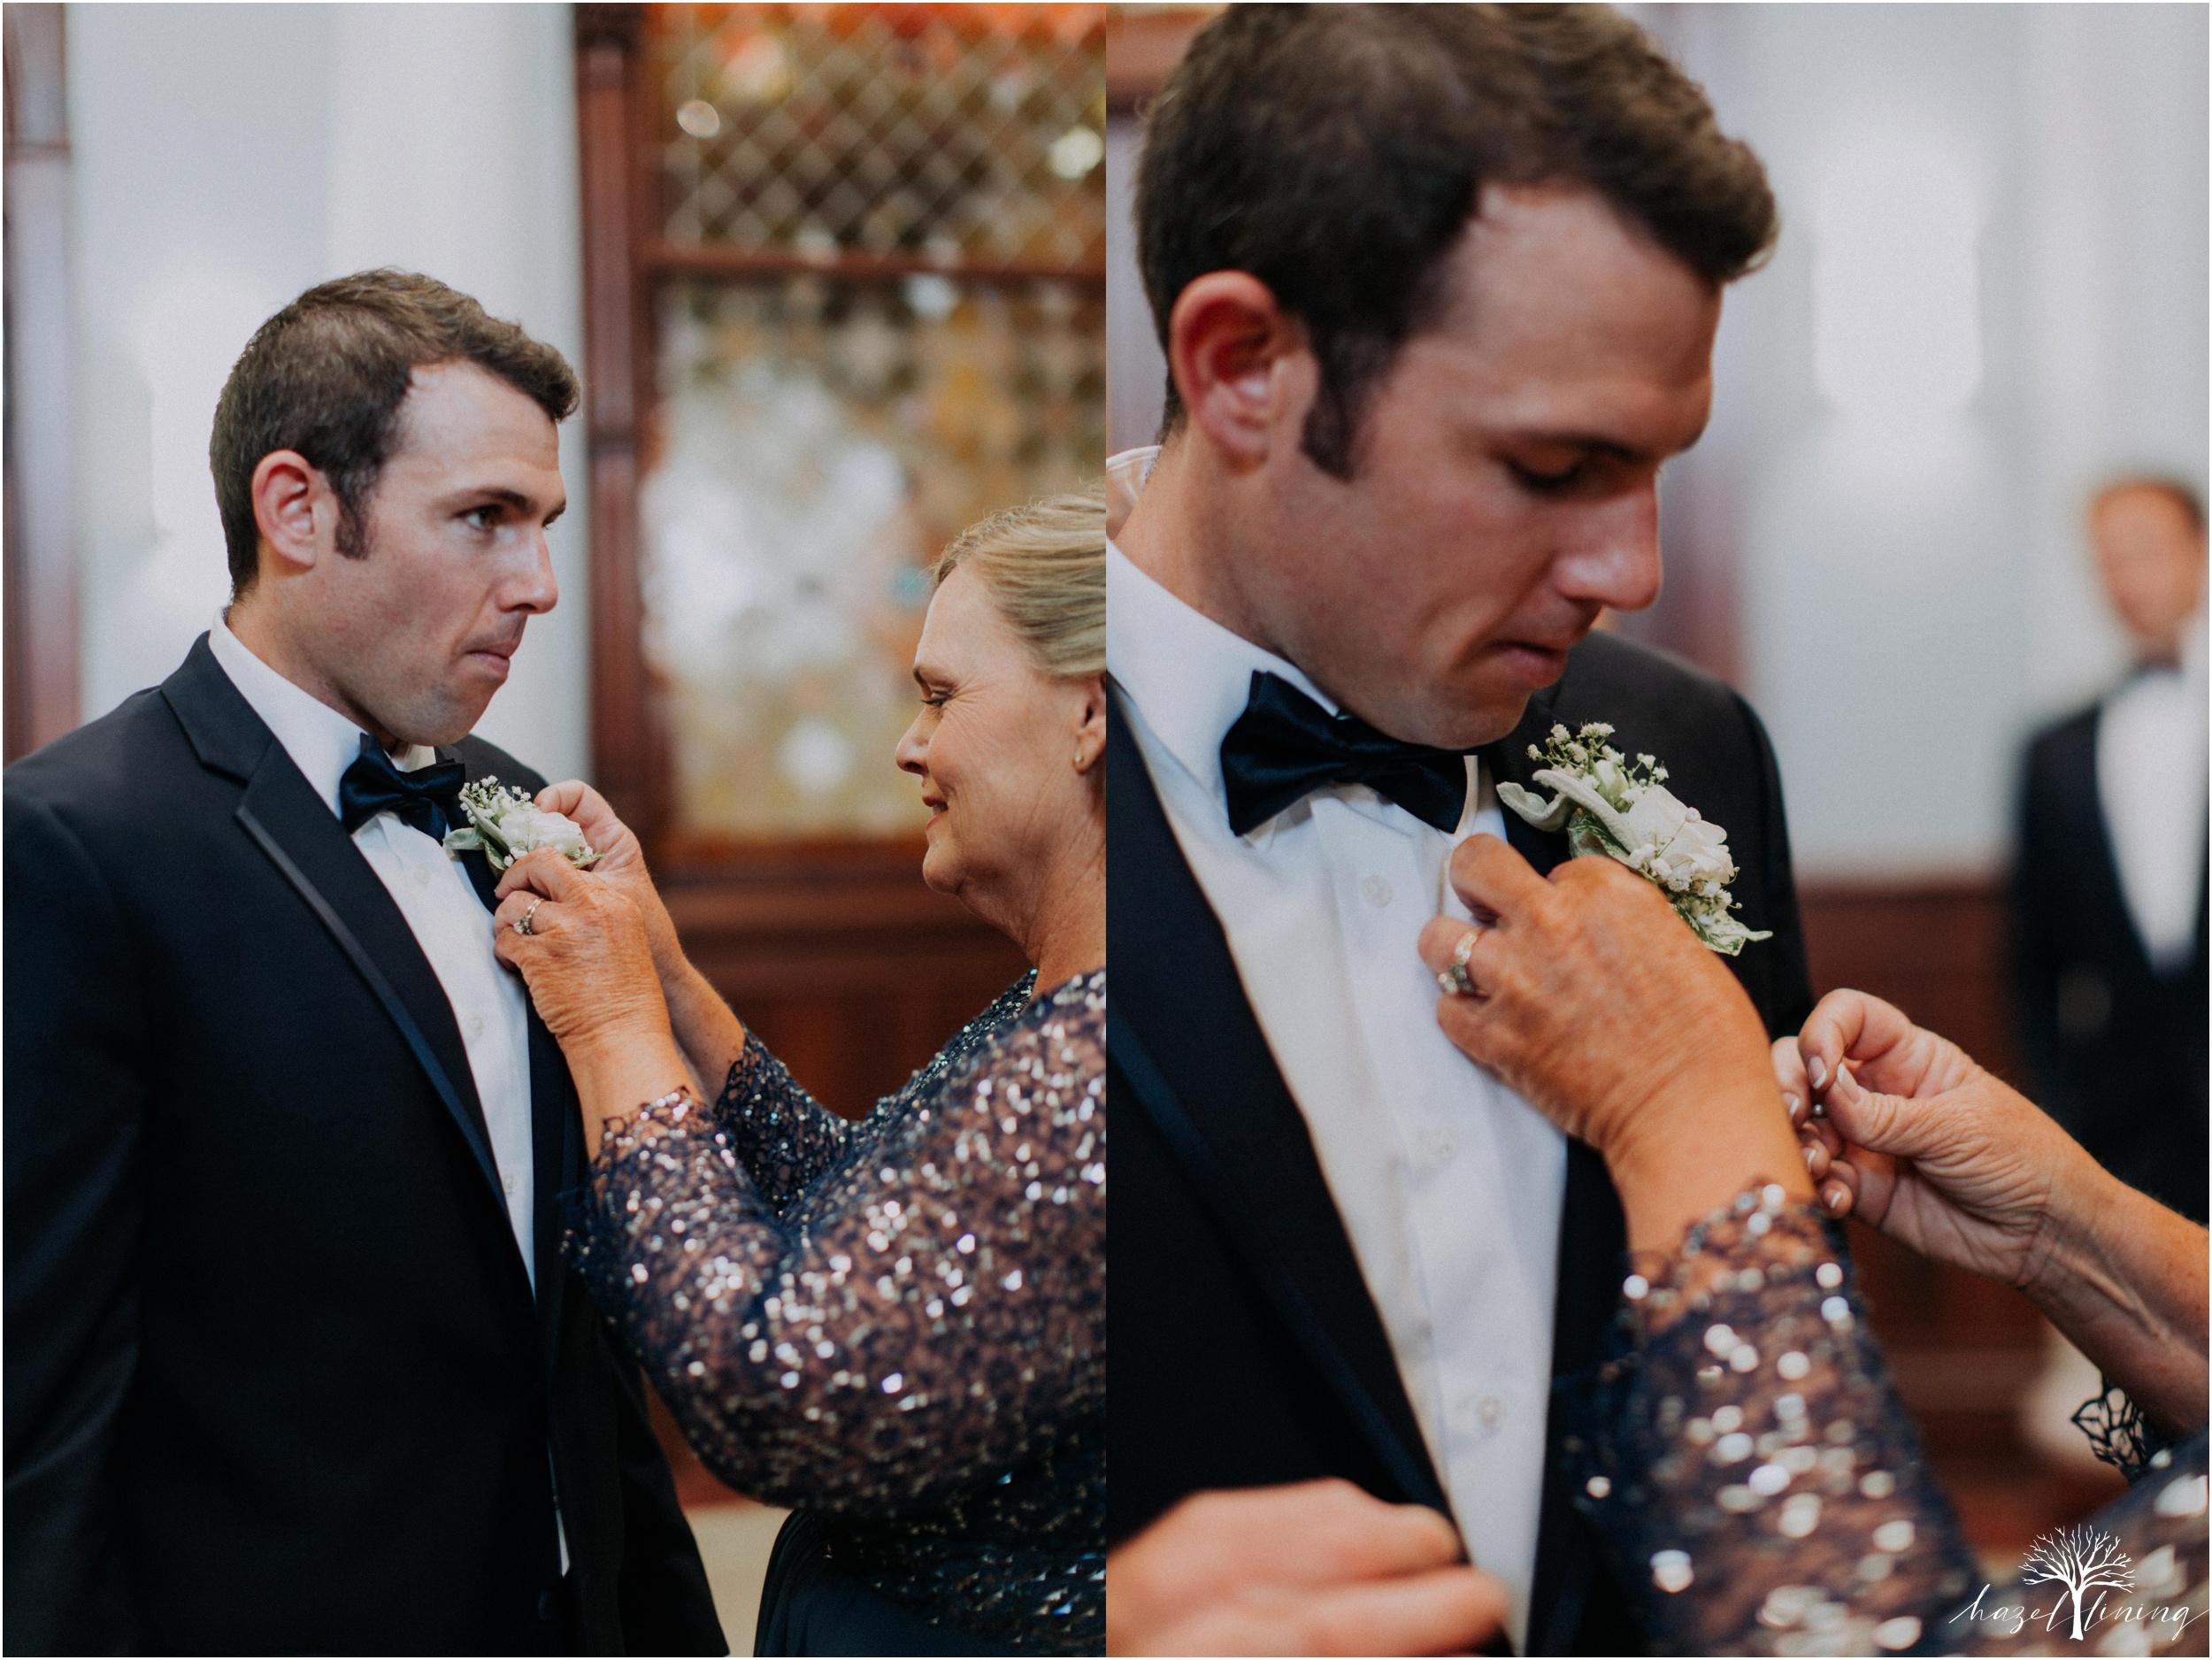 hazel-lining-travel-wedding-elopement-photography_0033.jpg